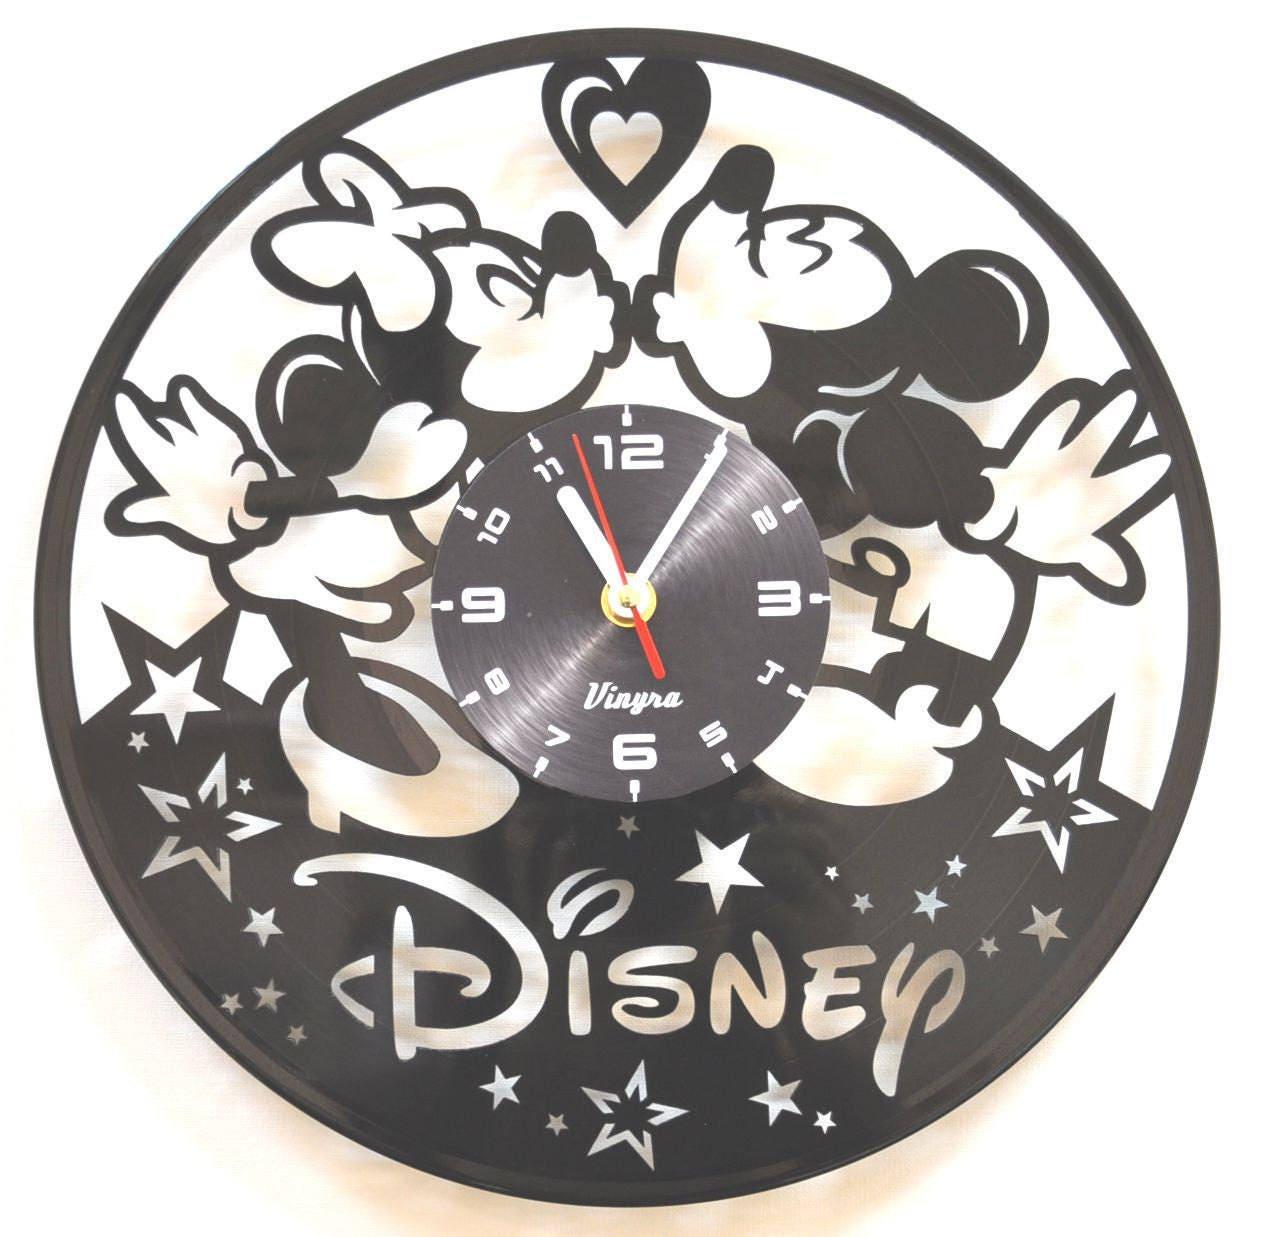 Mickey and minnie vinyl wall clock mickey mouse vinyl wall zoom amipublicfo Choice Image